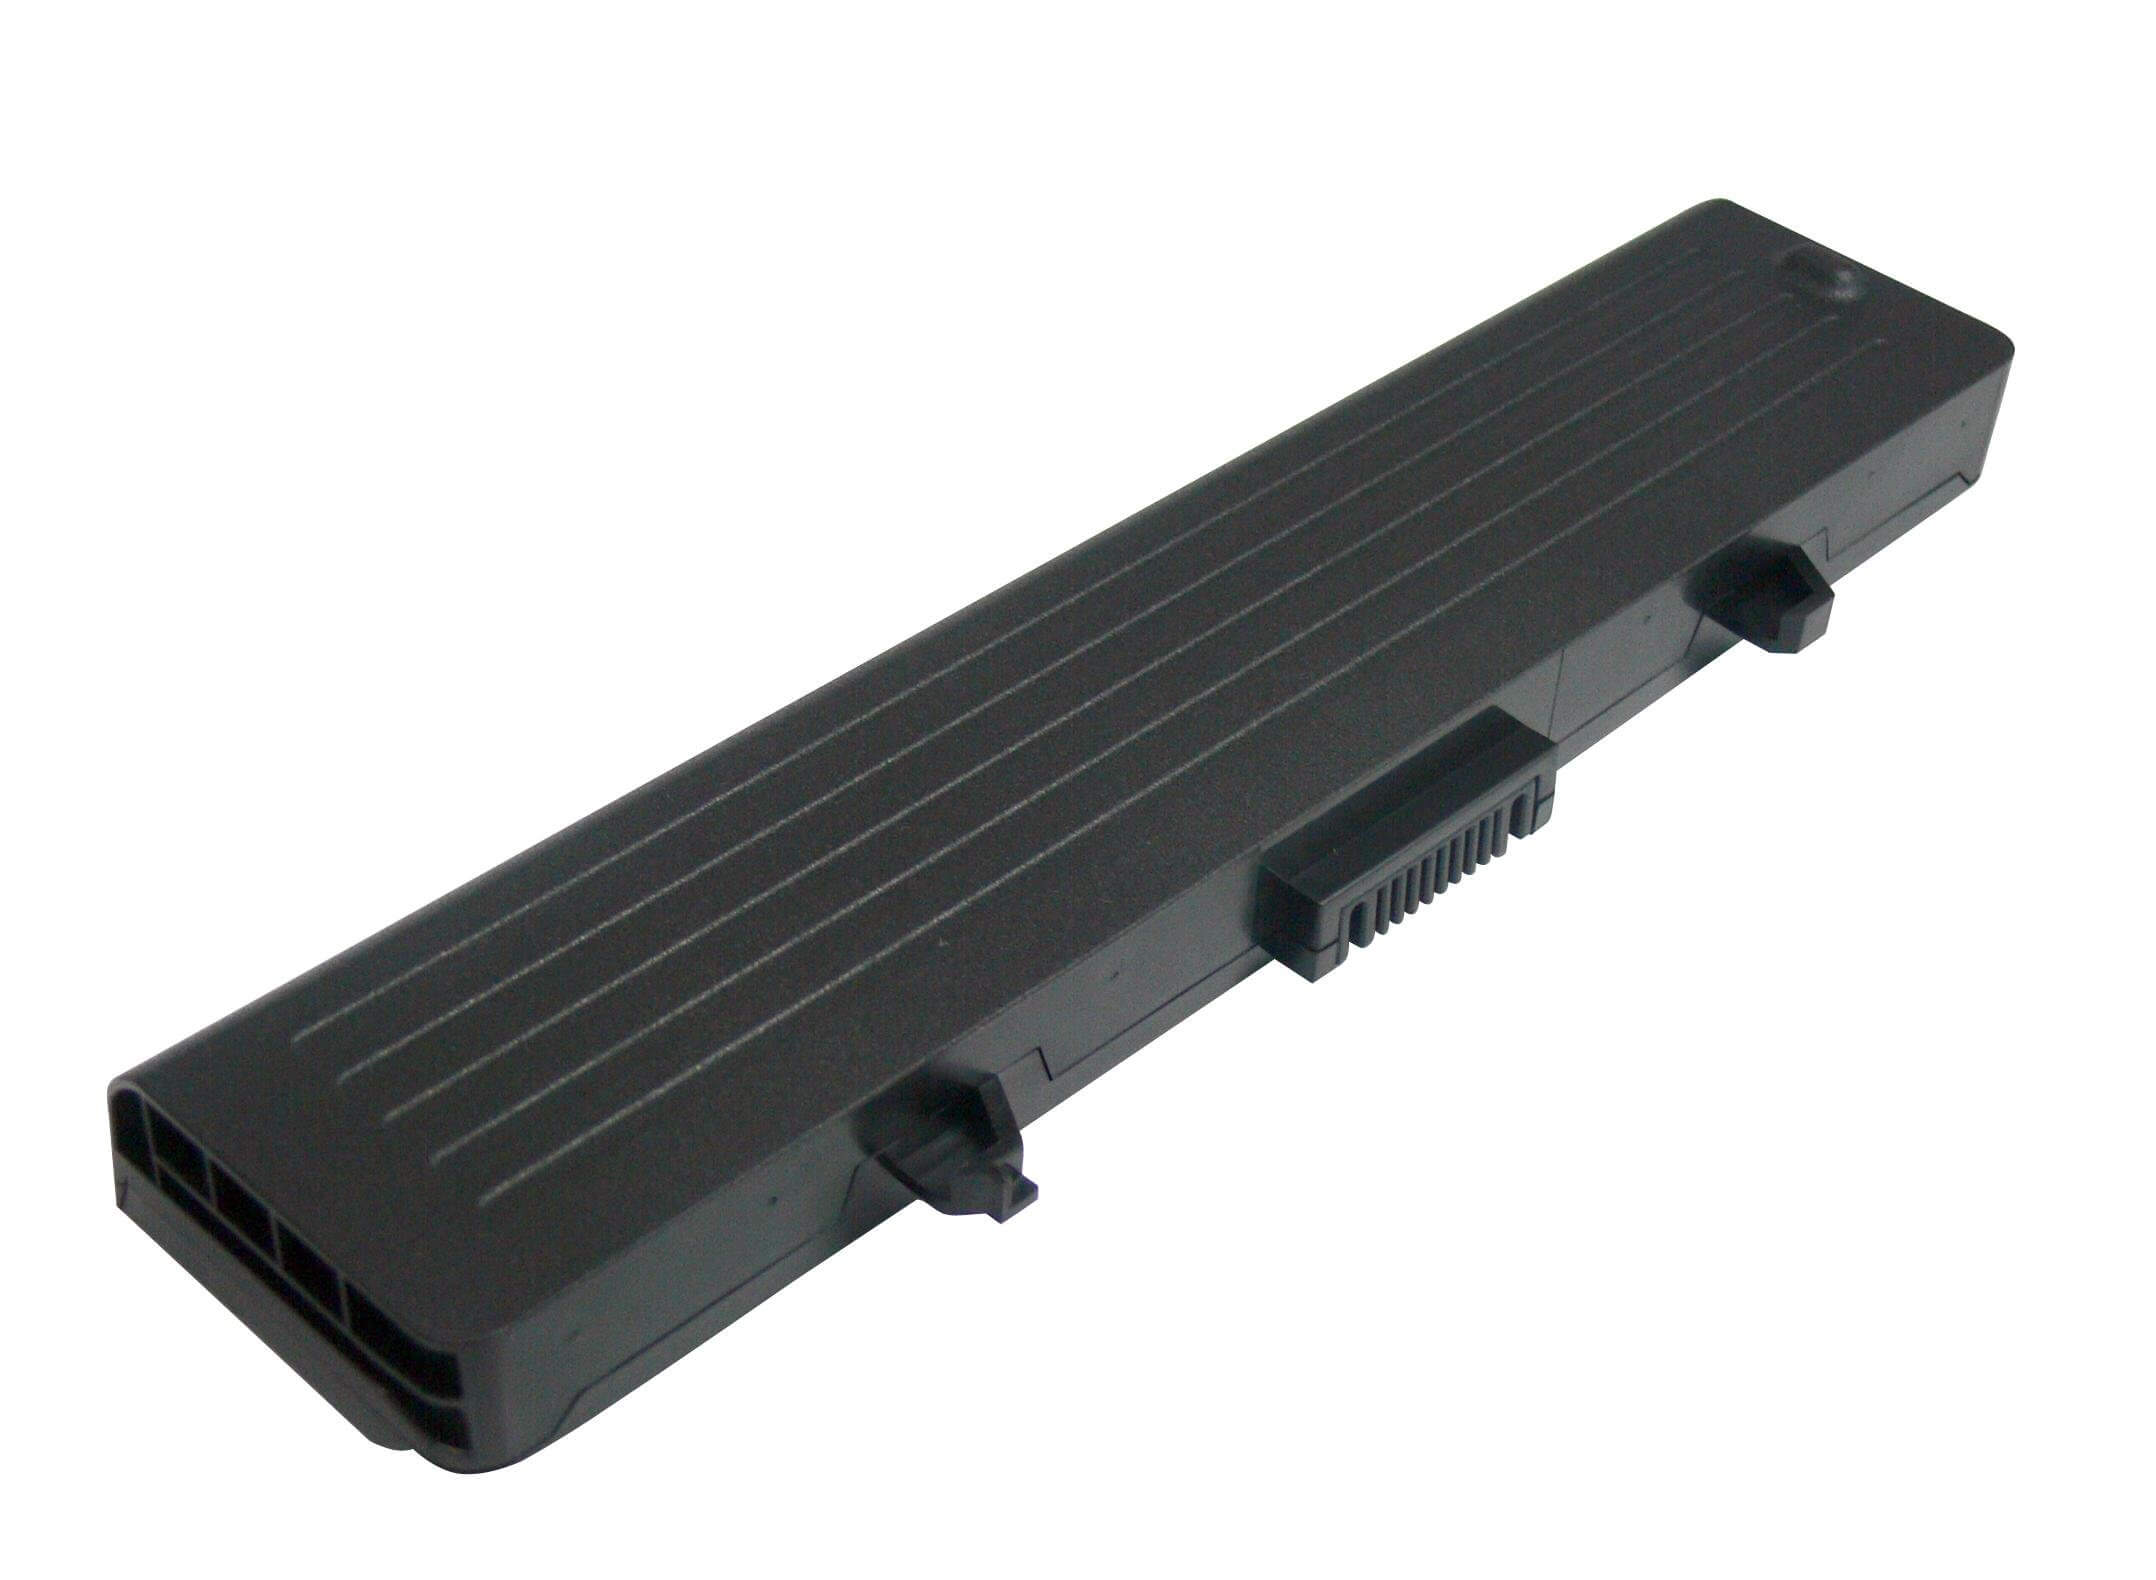 Dell Inspiron 1525 batteri 312-0625/Inspiron 1545